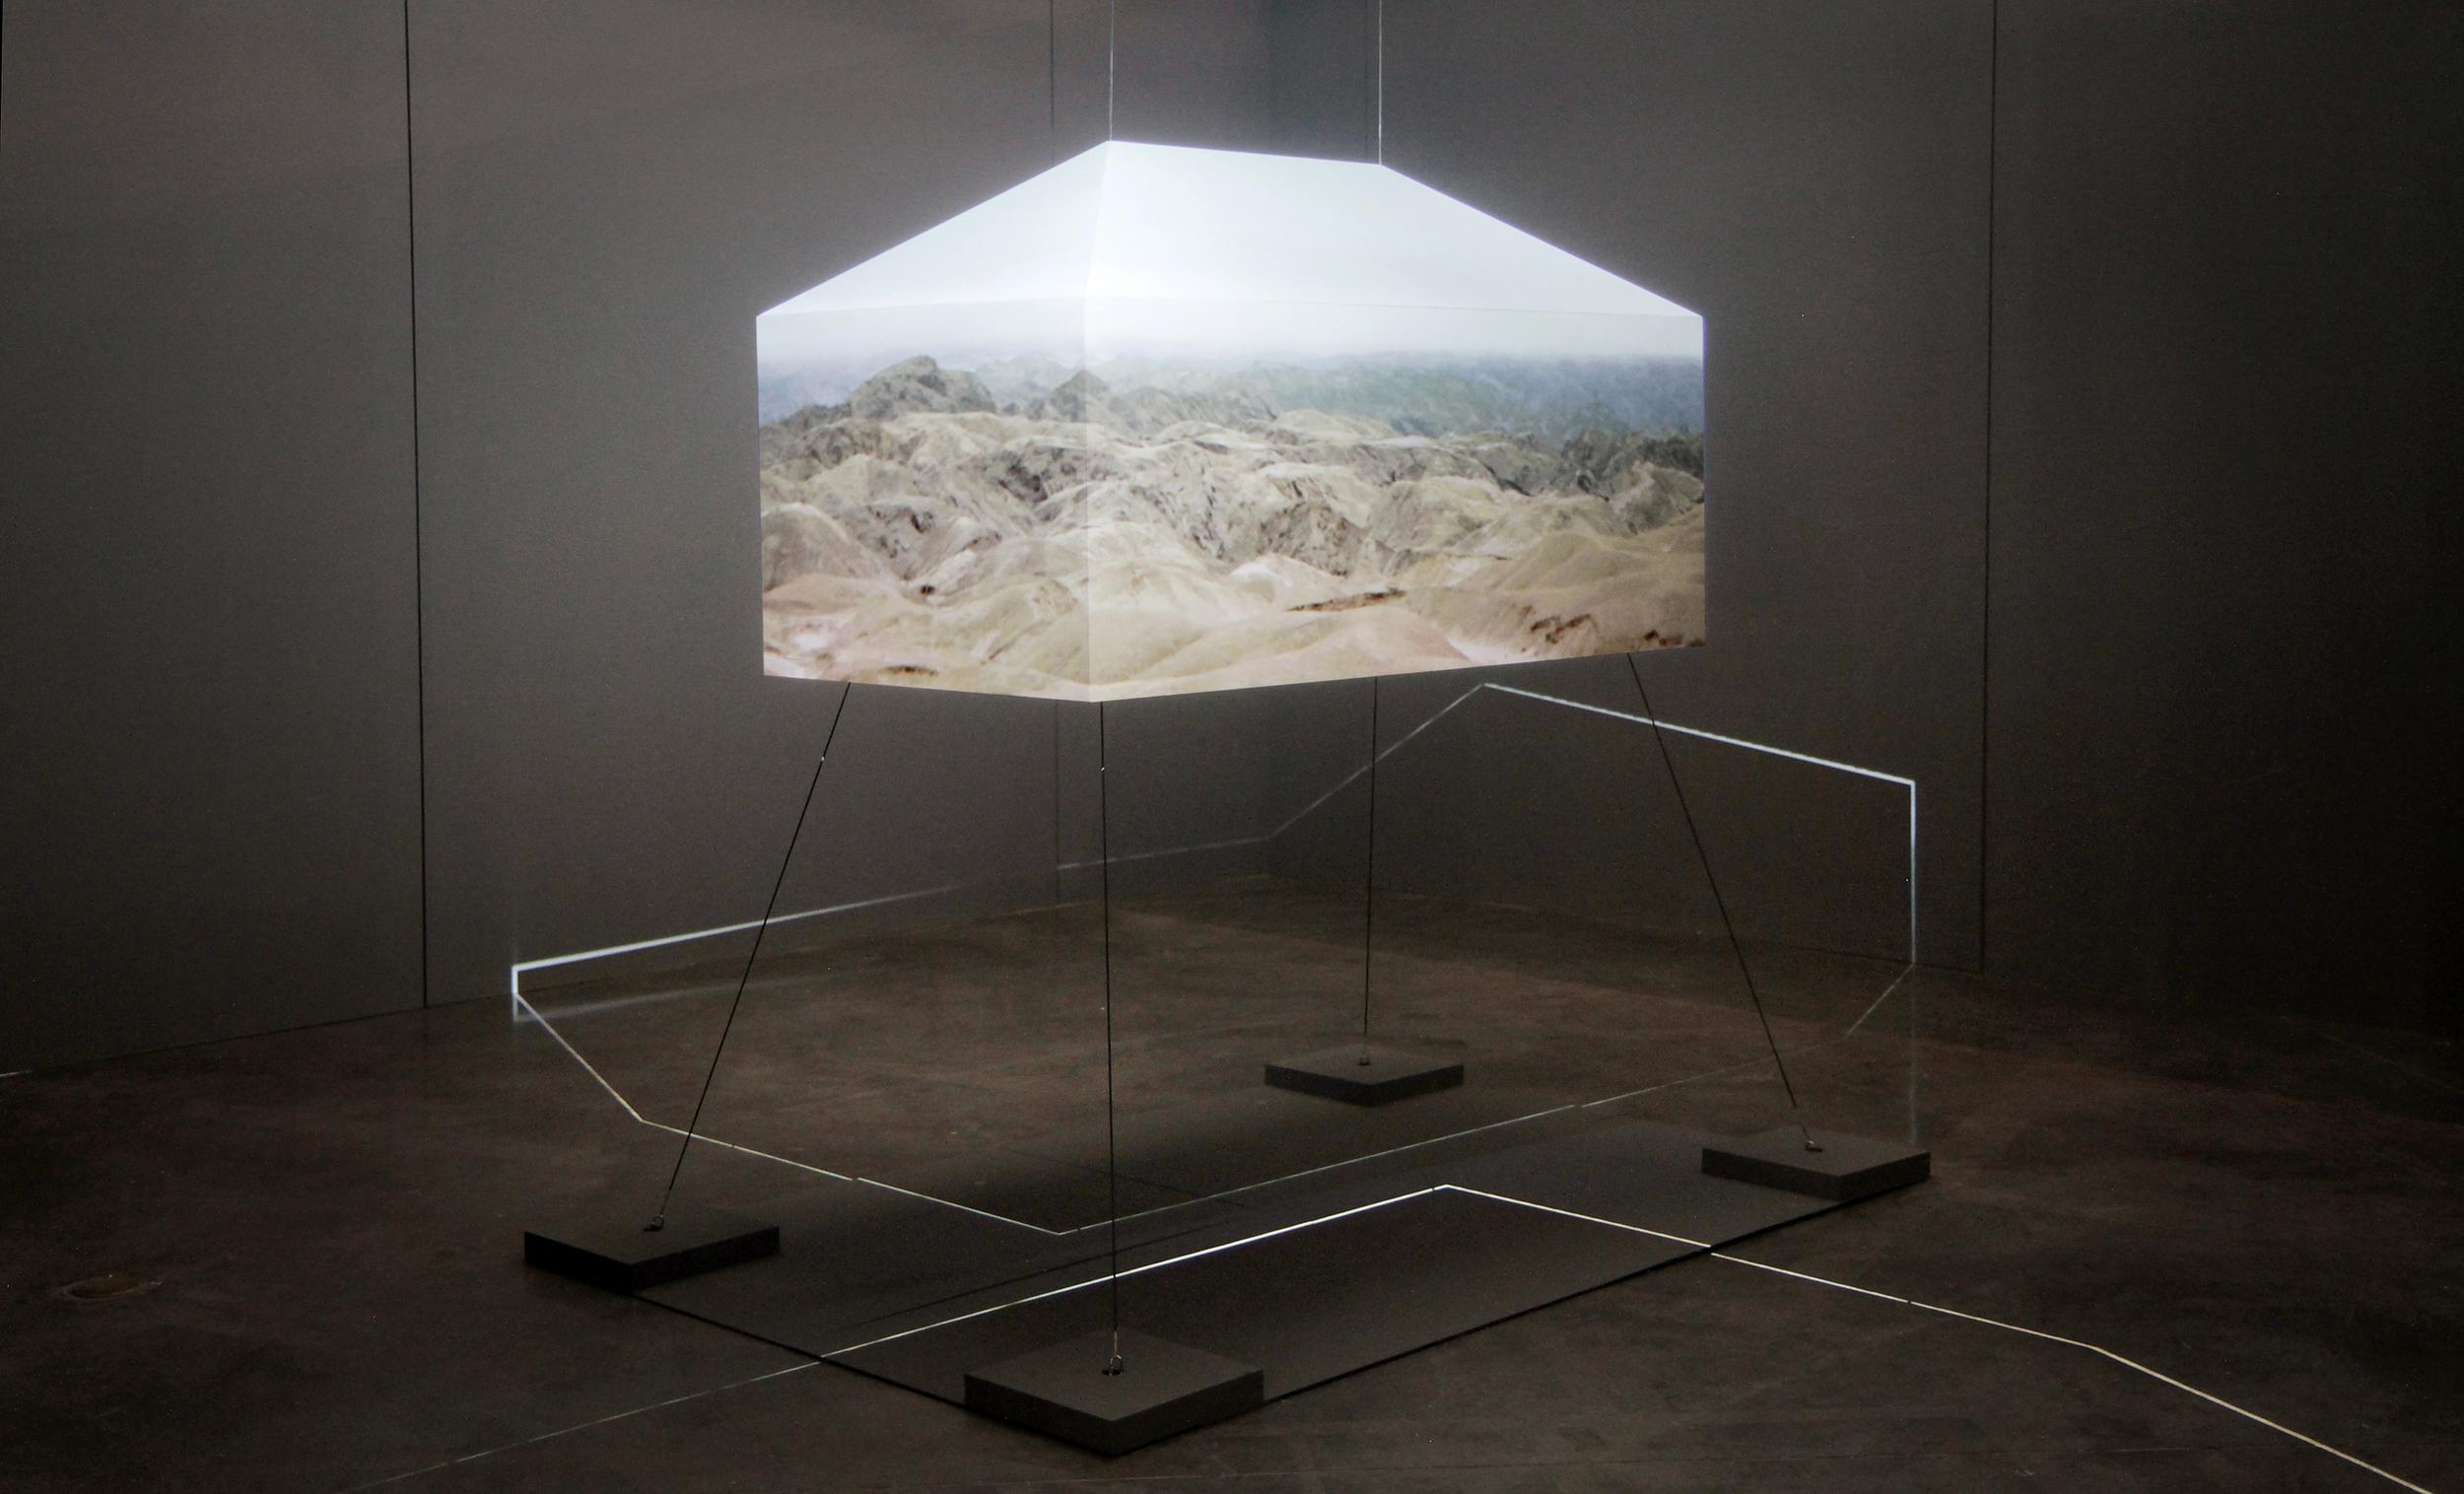 Riikka Kuoppala: And That's All I Remember. Installation image at Le Fresnoy - Studio national des arts contemporains, 2015. Photo: Riikka Kuoppala